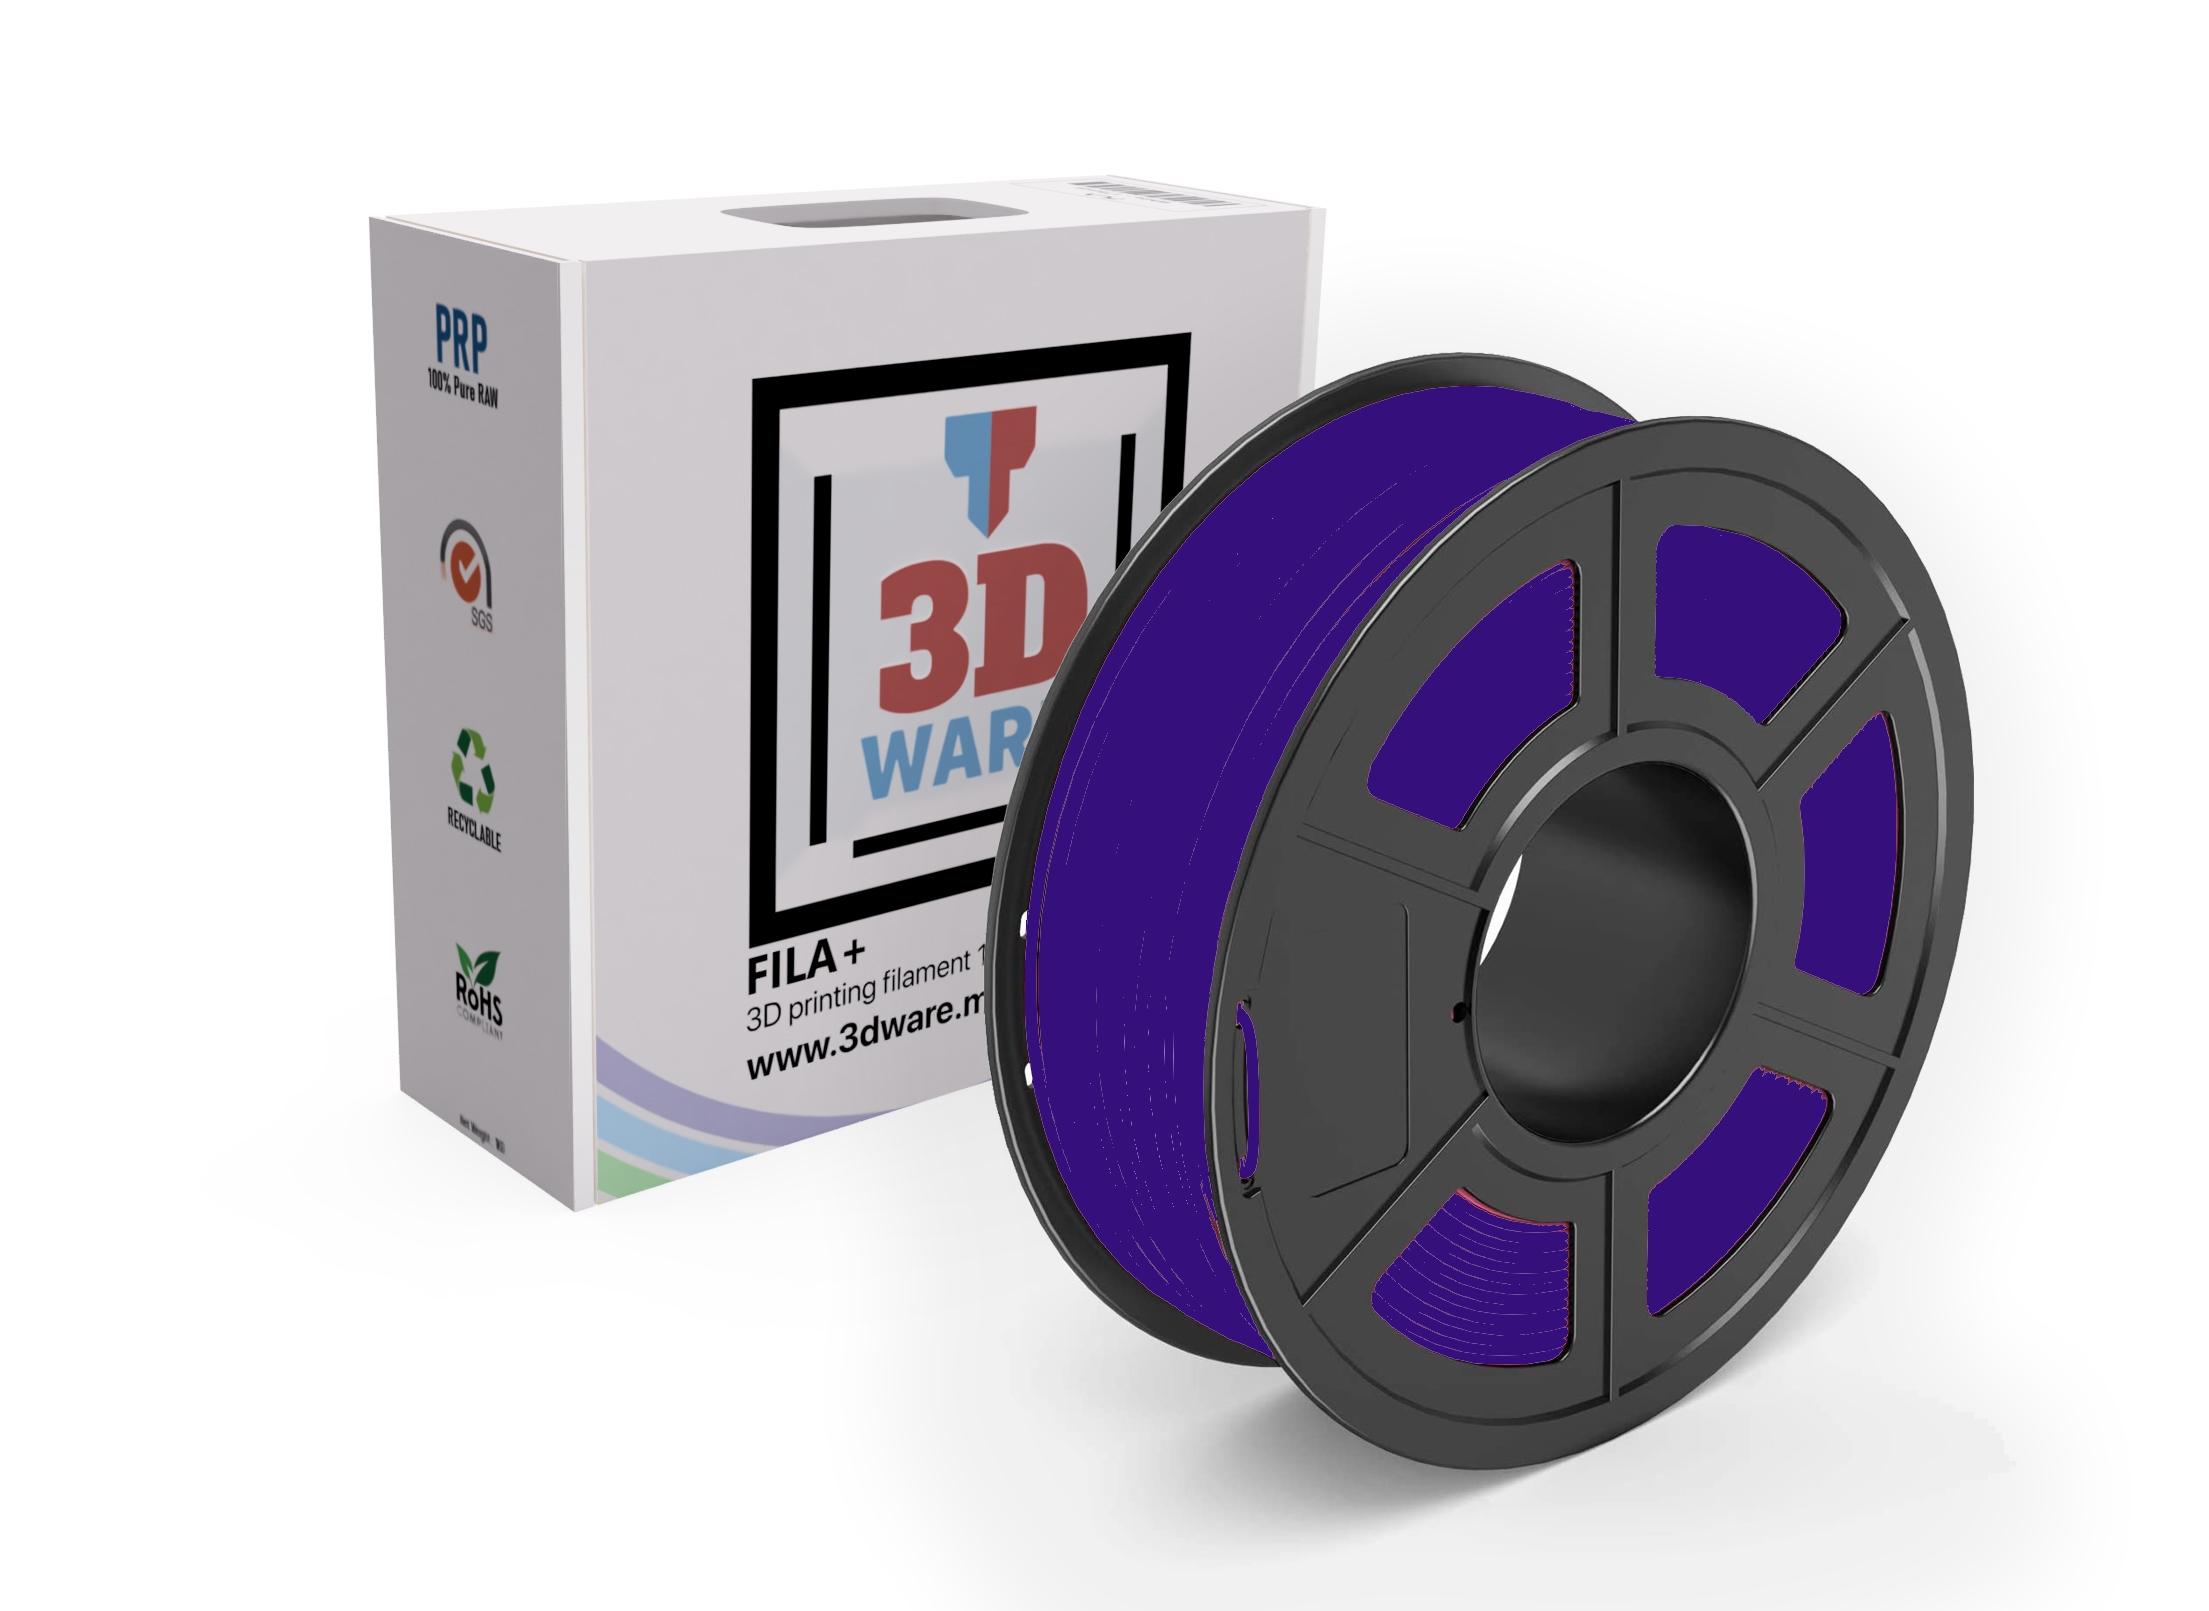 Filament 3D PLA FILA+ Pro Violet 1.75mm 1kg